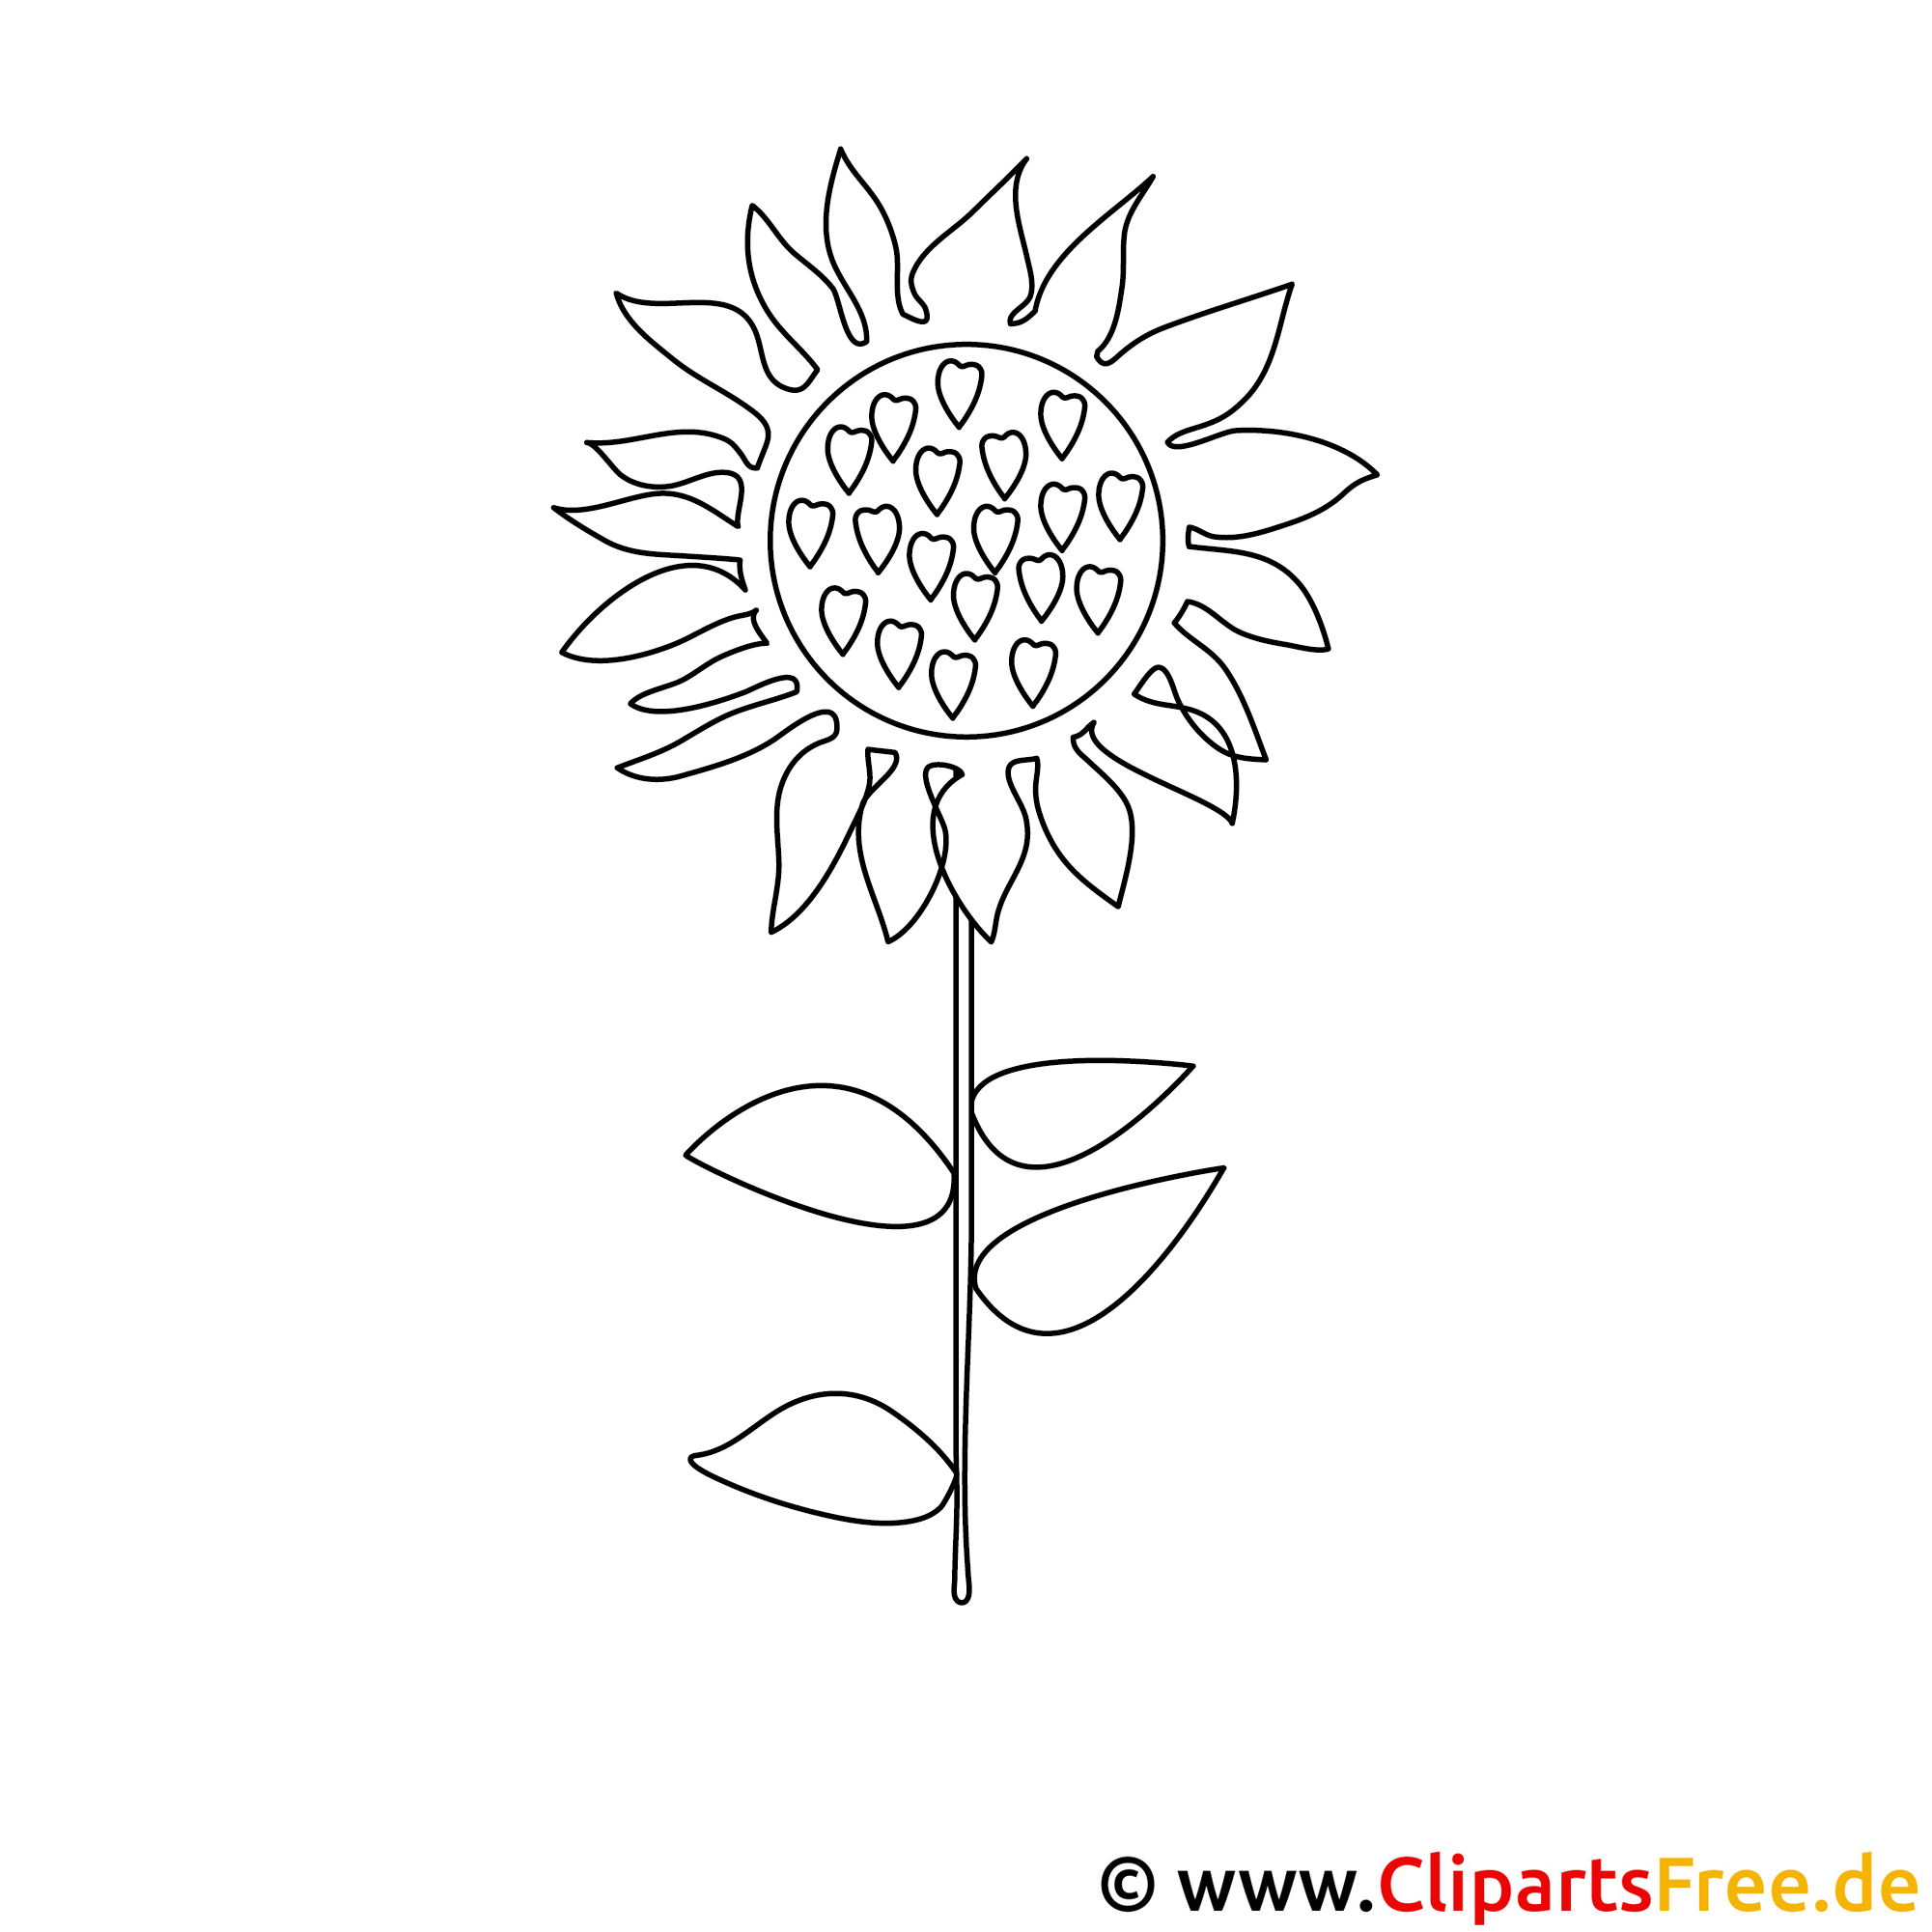 Sonnenblume Ausmalbild gratis